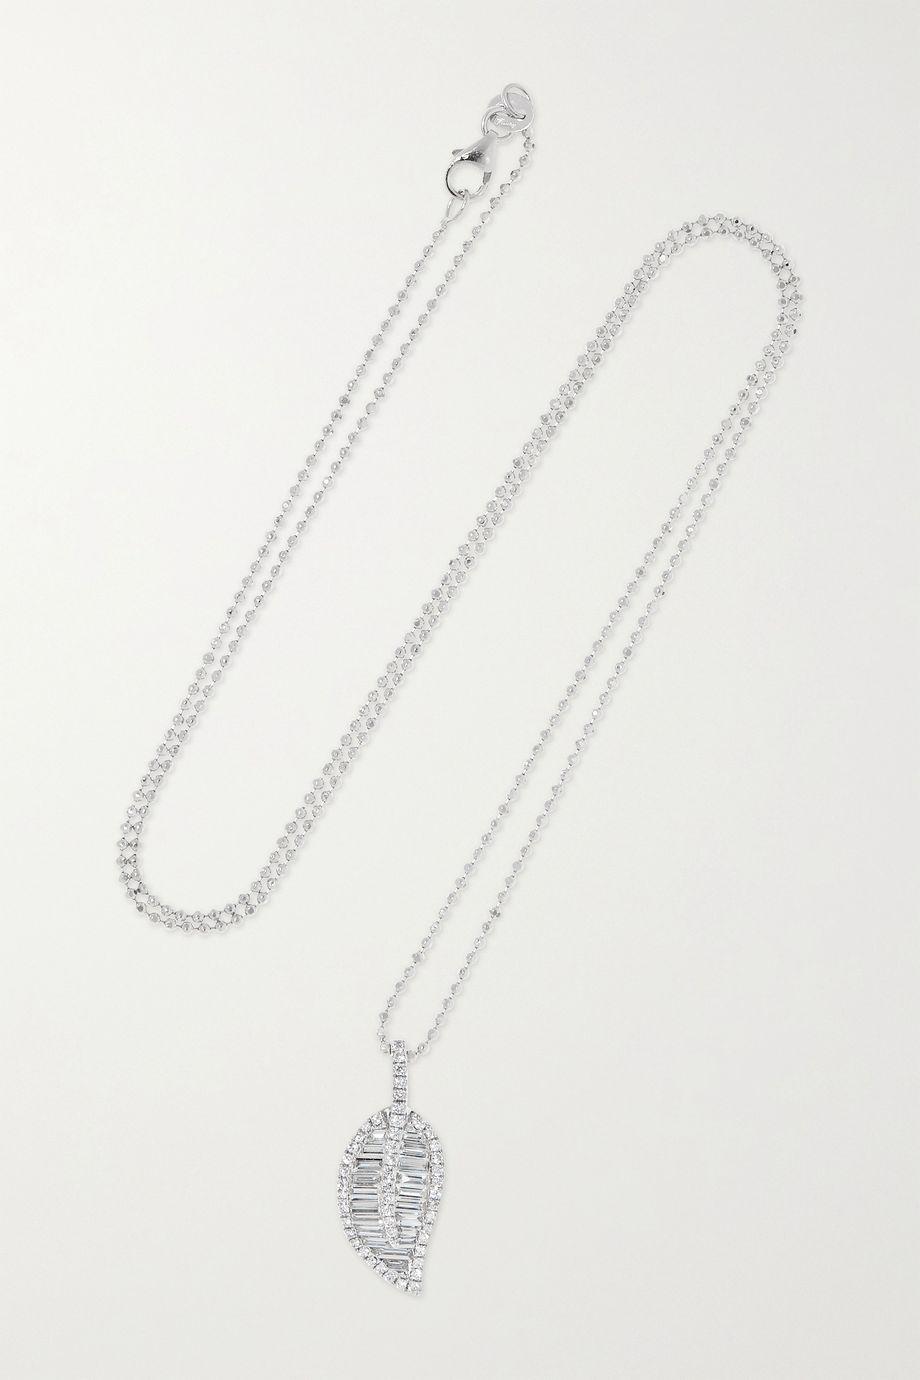 Anita Ko 18K 白金钻石项链